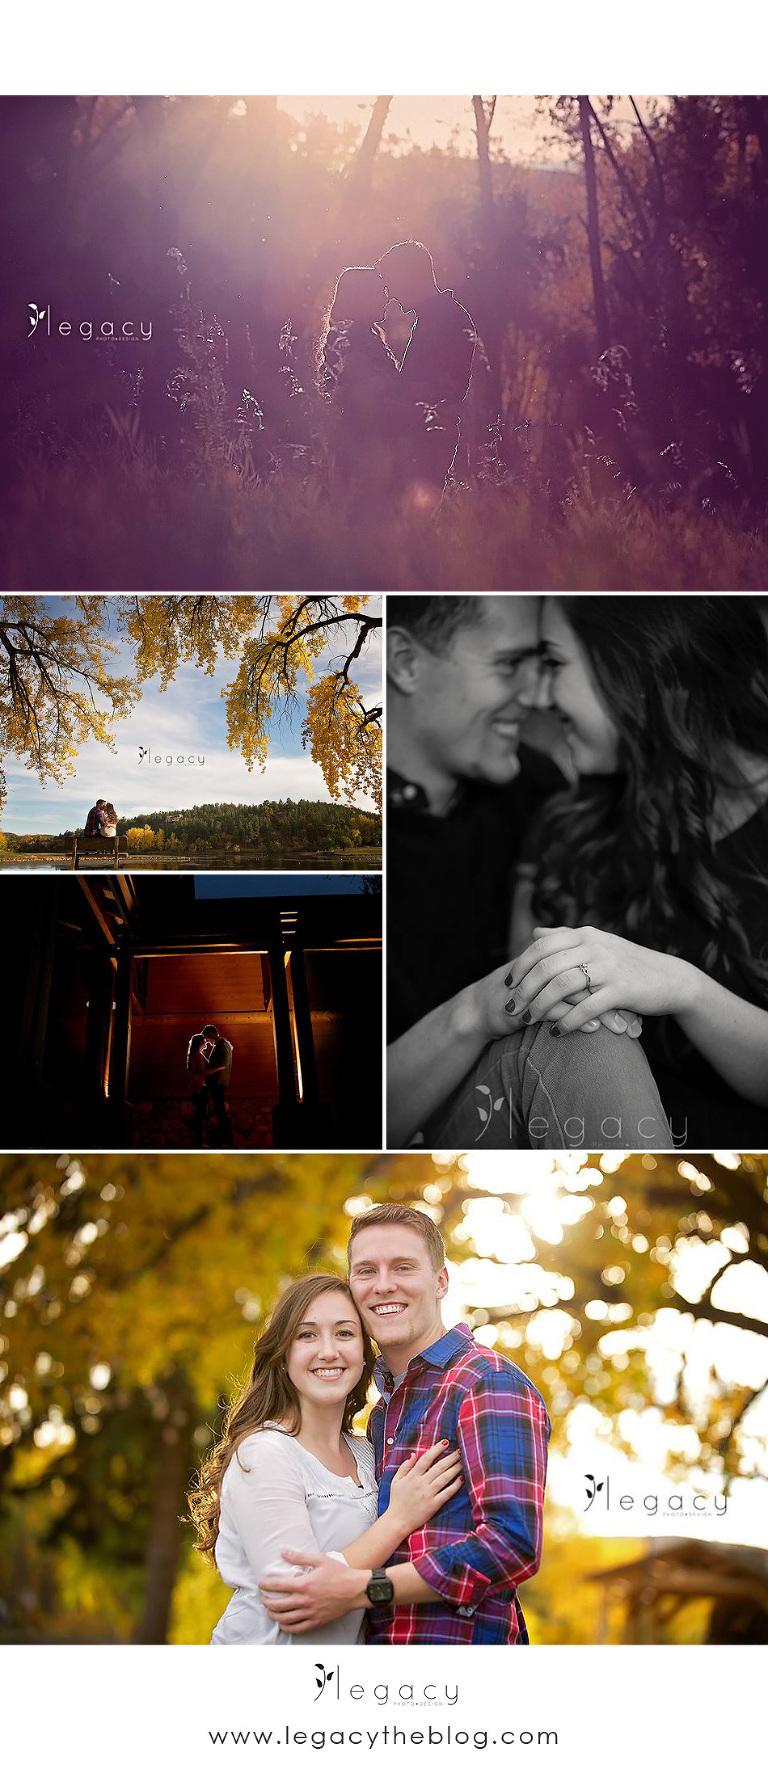 Kate and Alan | Engagement Session {Rapid City Wedding Photography} » legacytheblog.com